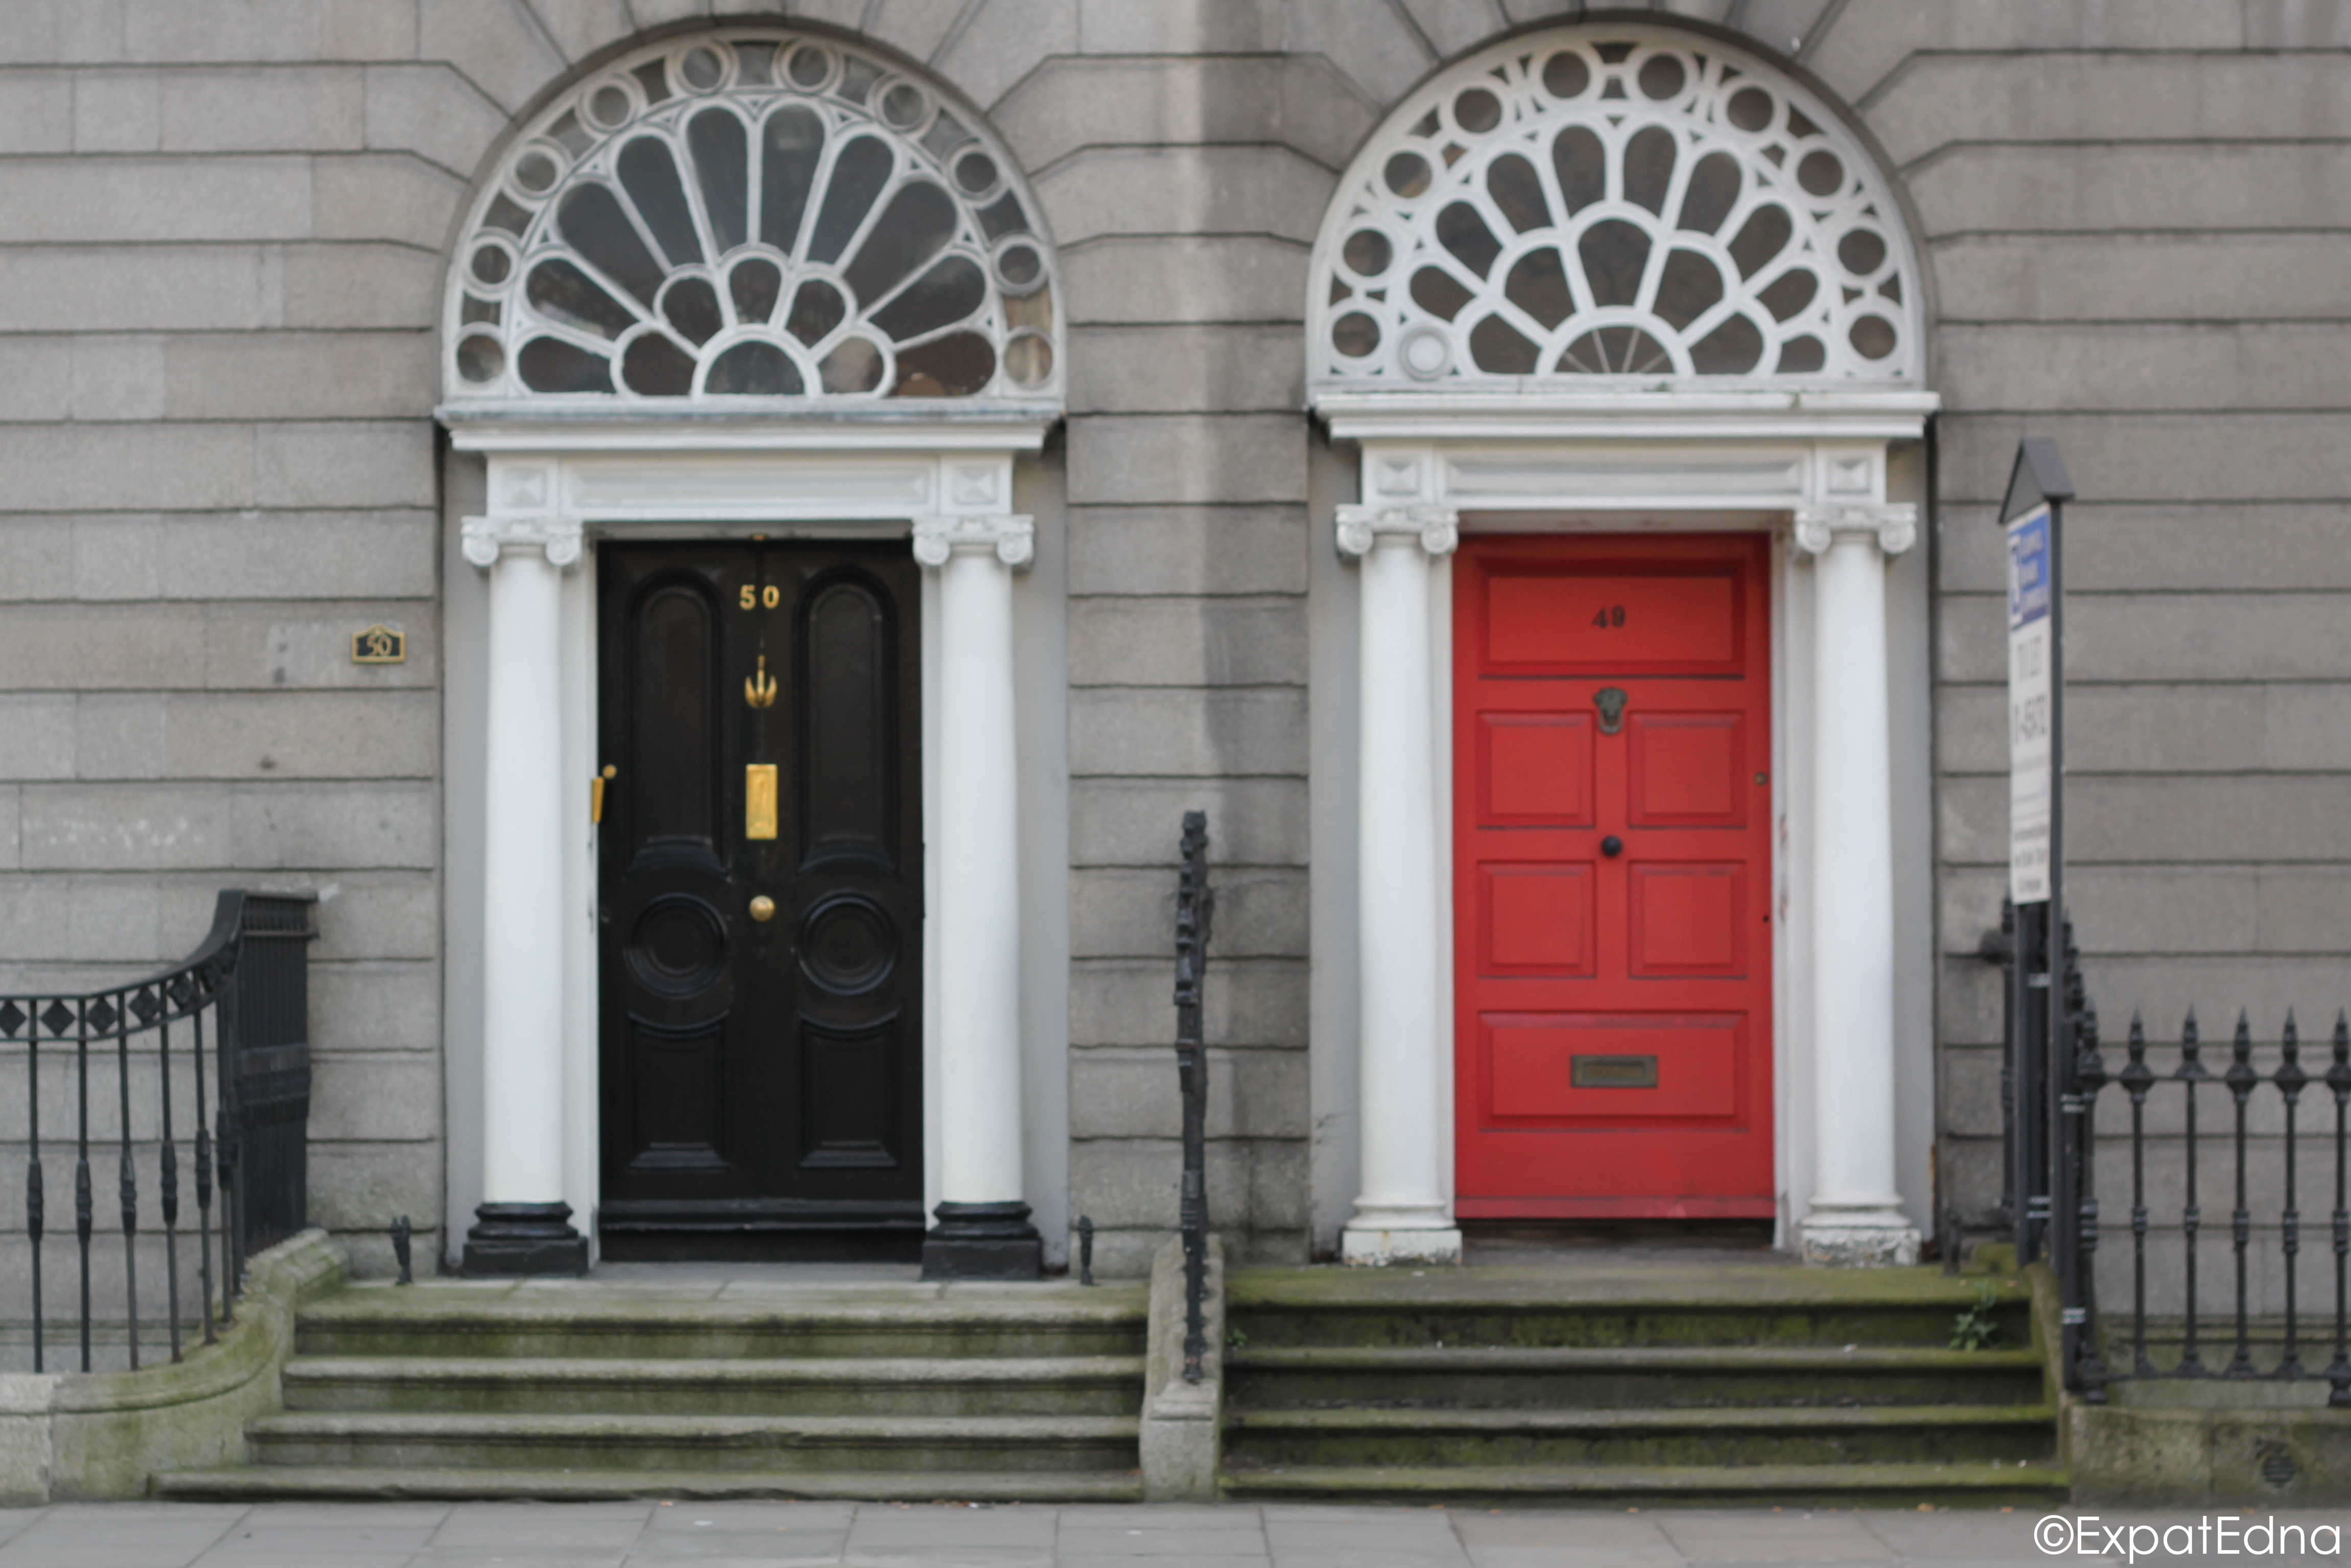 Sources ... & The Georgian Doors of Dublin - Expat Edna